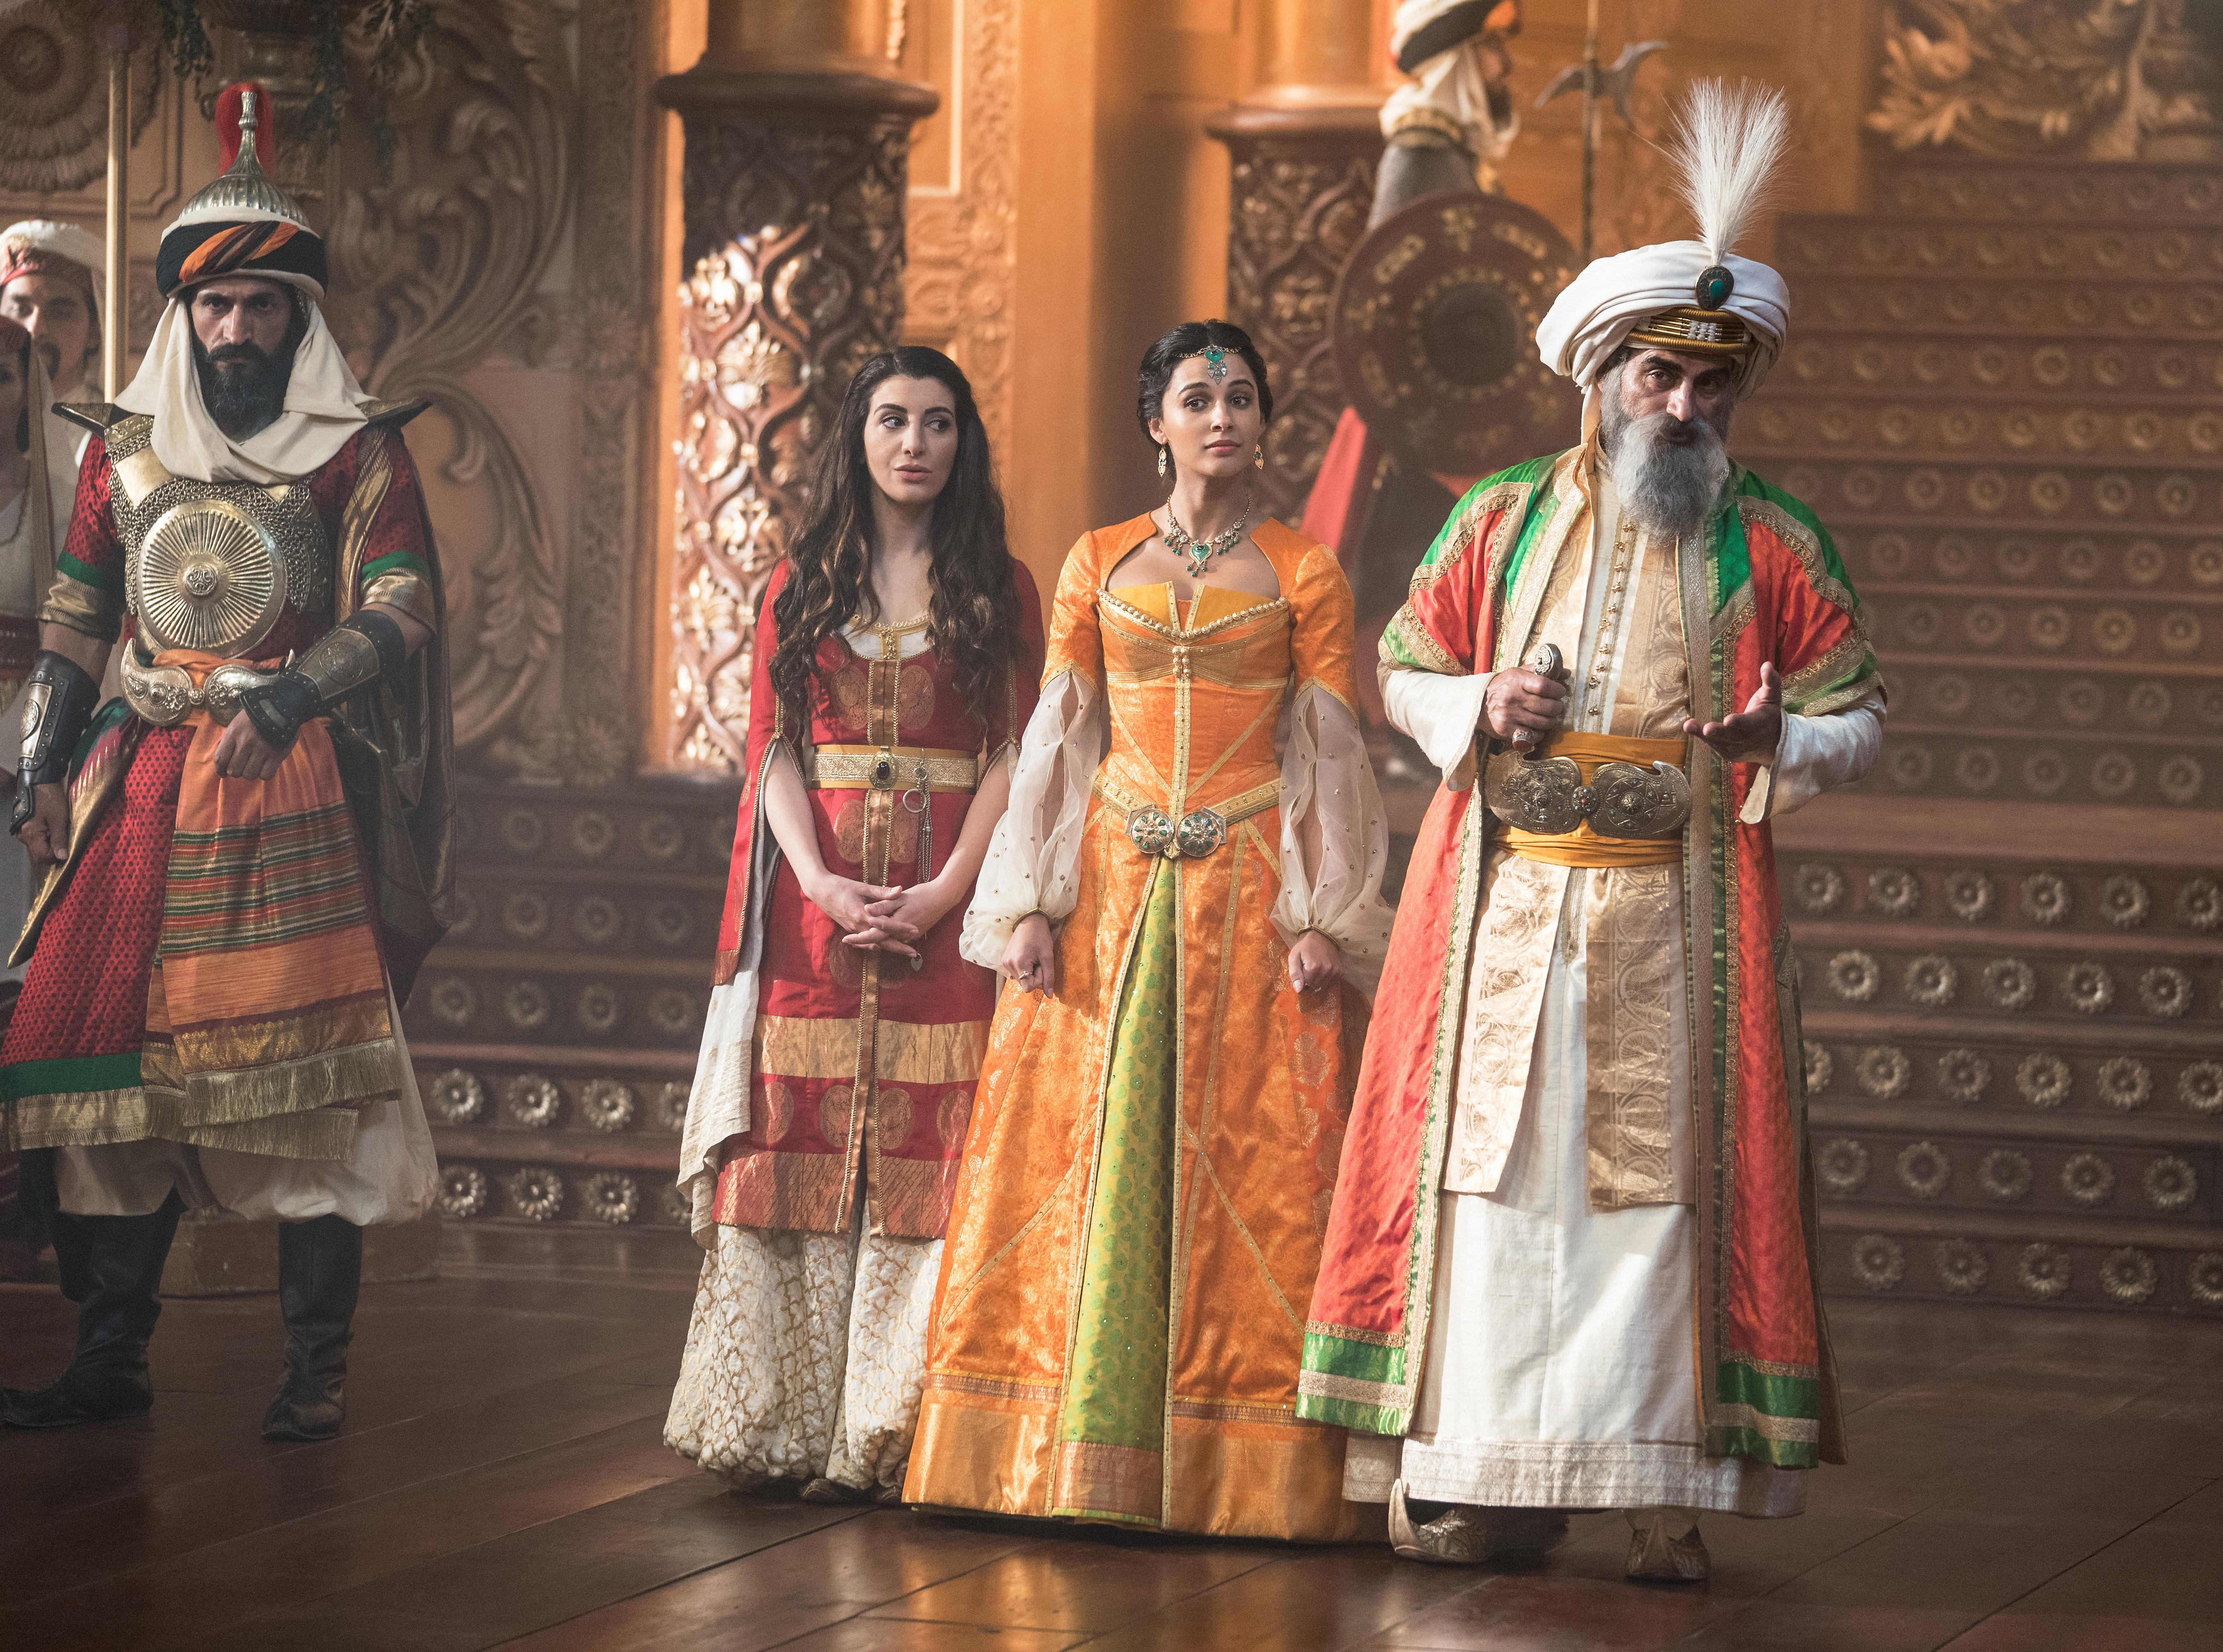 Aladdin 2019 costumes